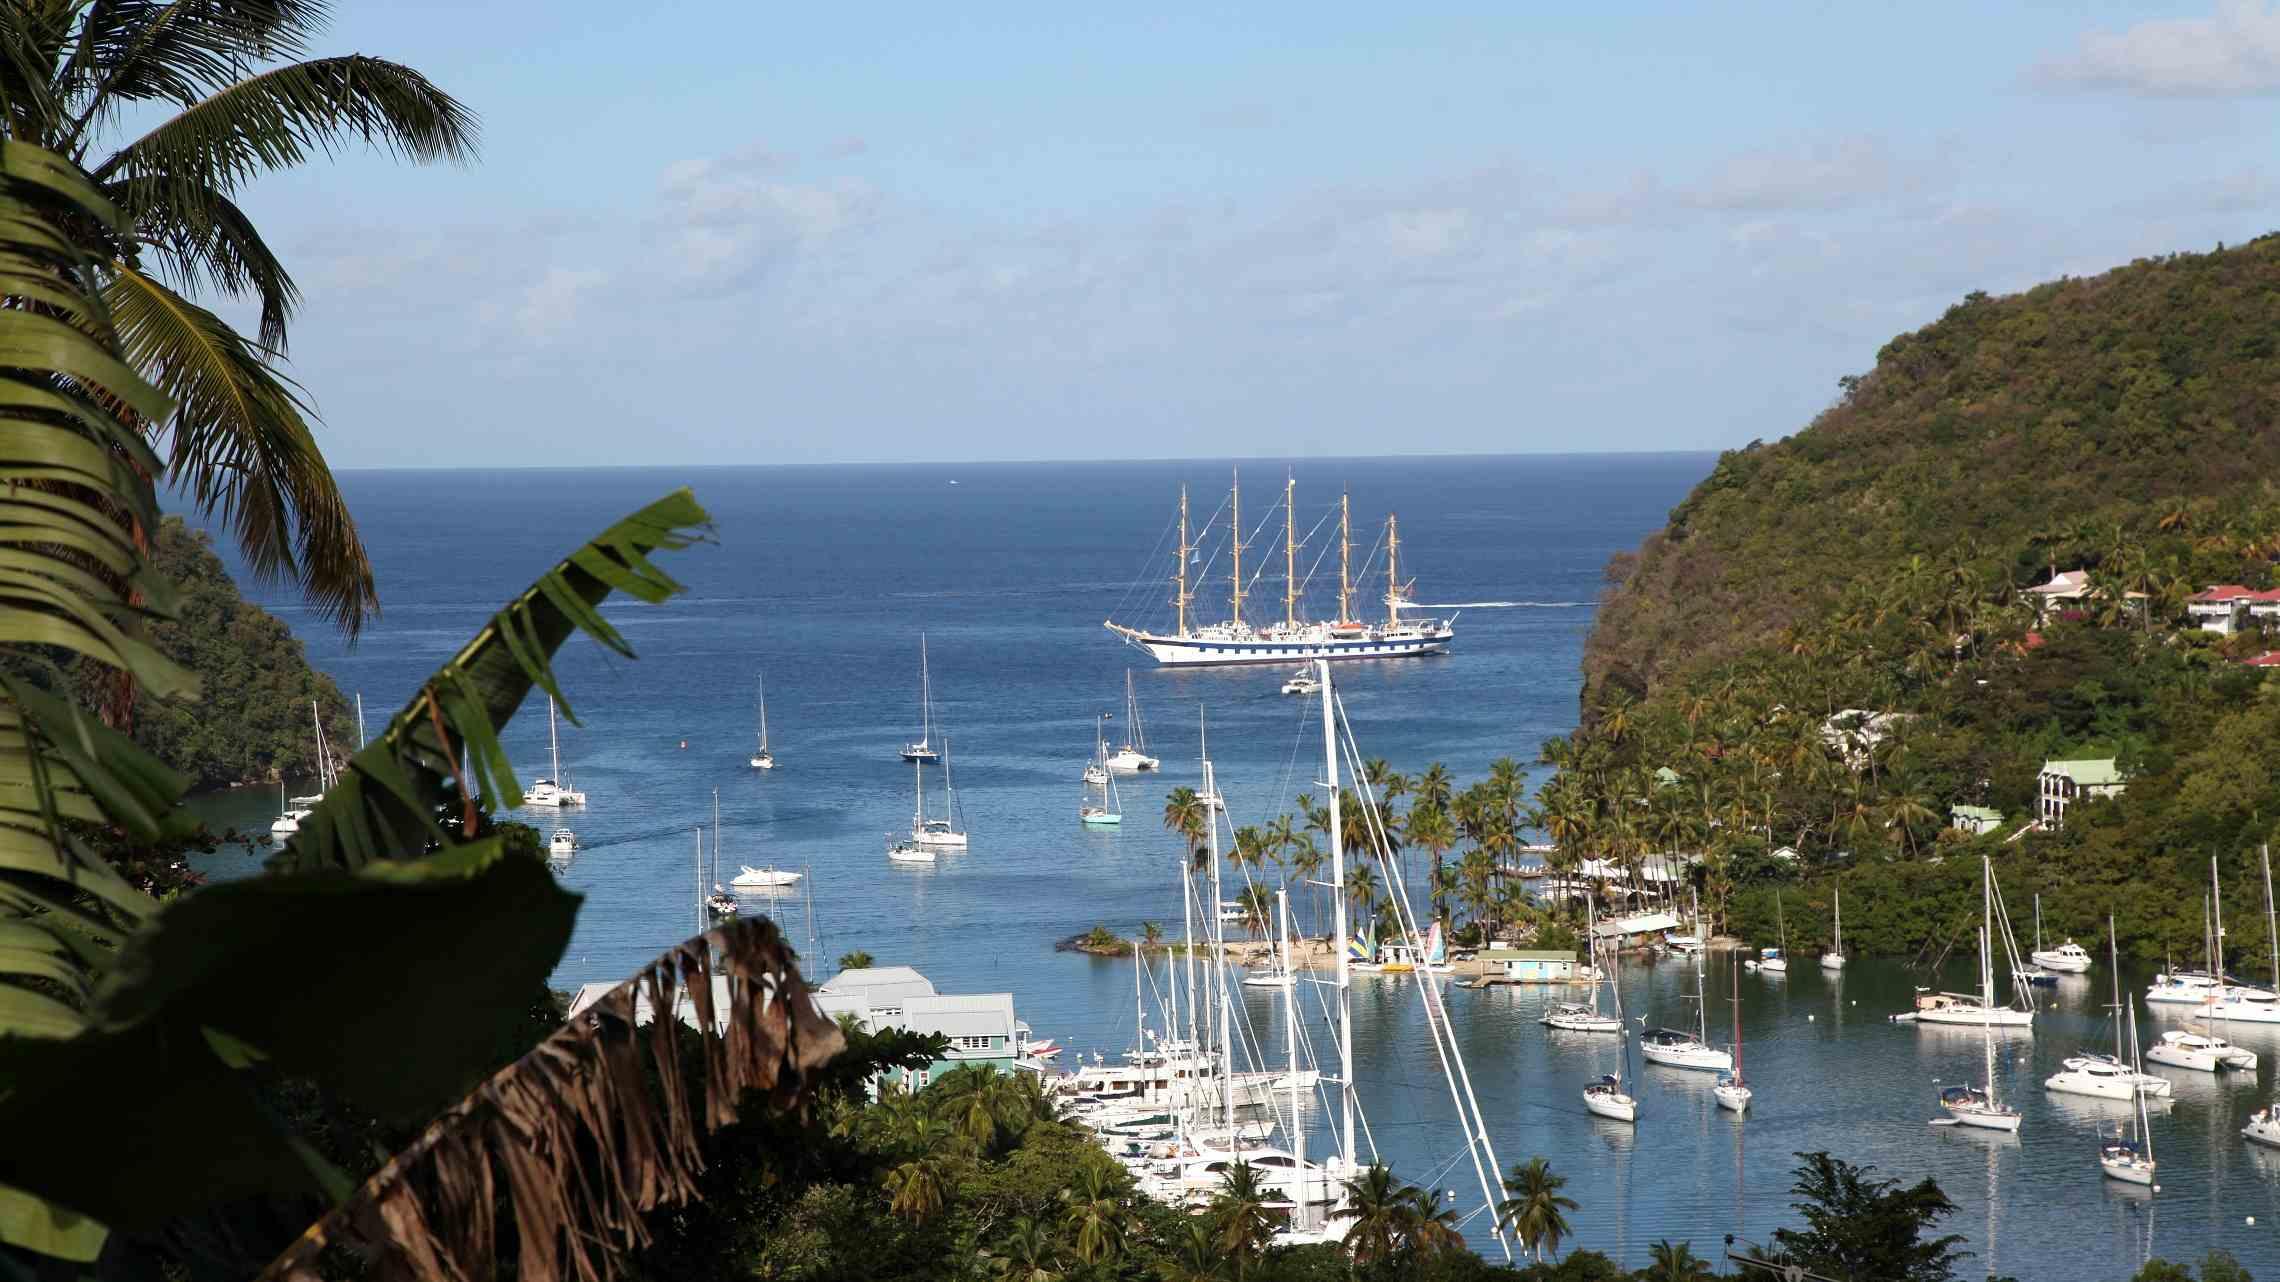 Marigot-Bay-St-Lucia-1920x1080.jpg